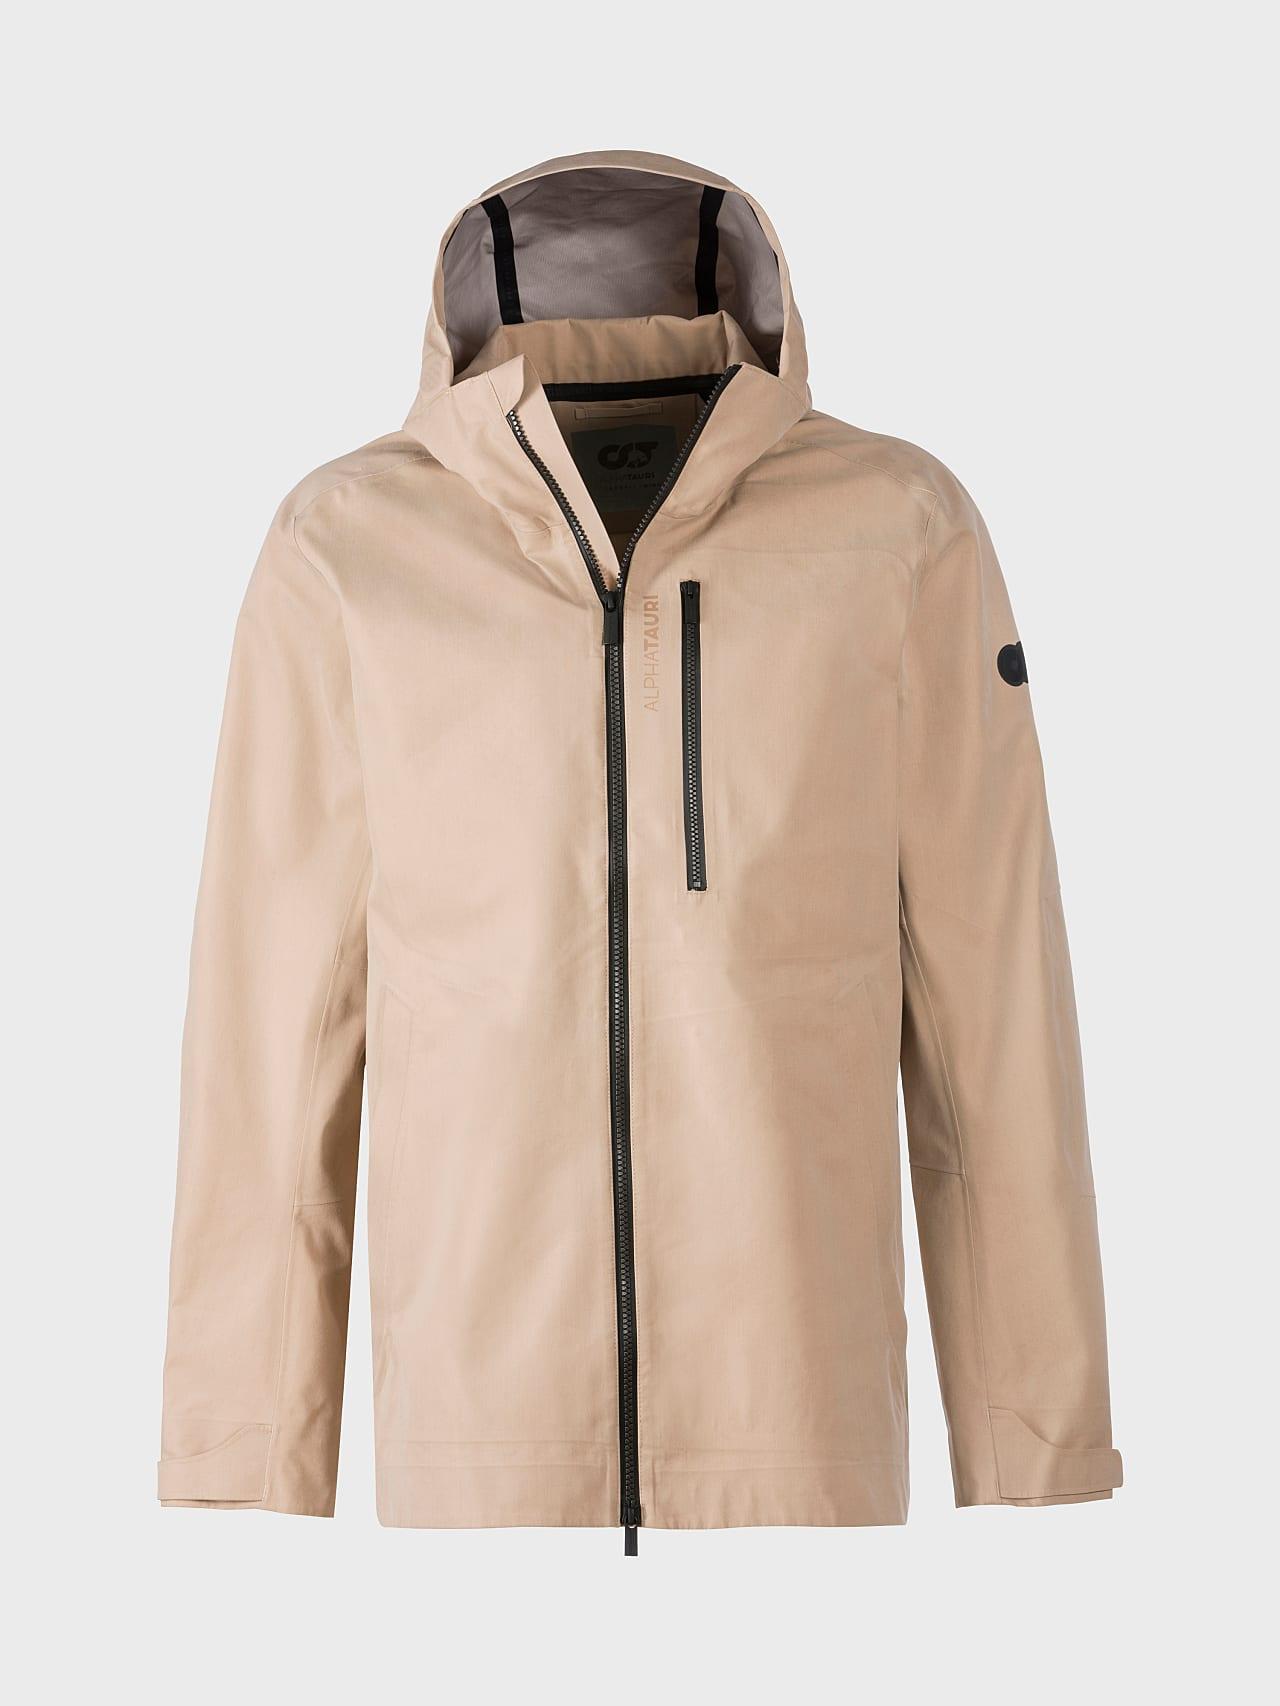 OKOVO V3.Y5.01 Packable Waterproof Jacket Sand Back Alpha Tauri